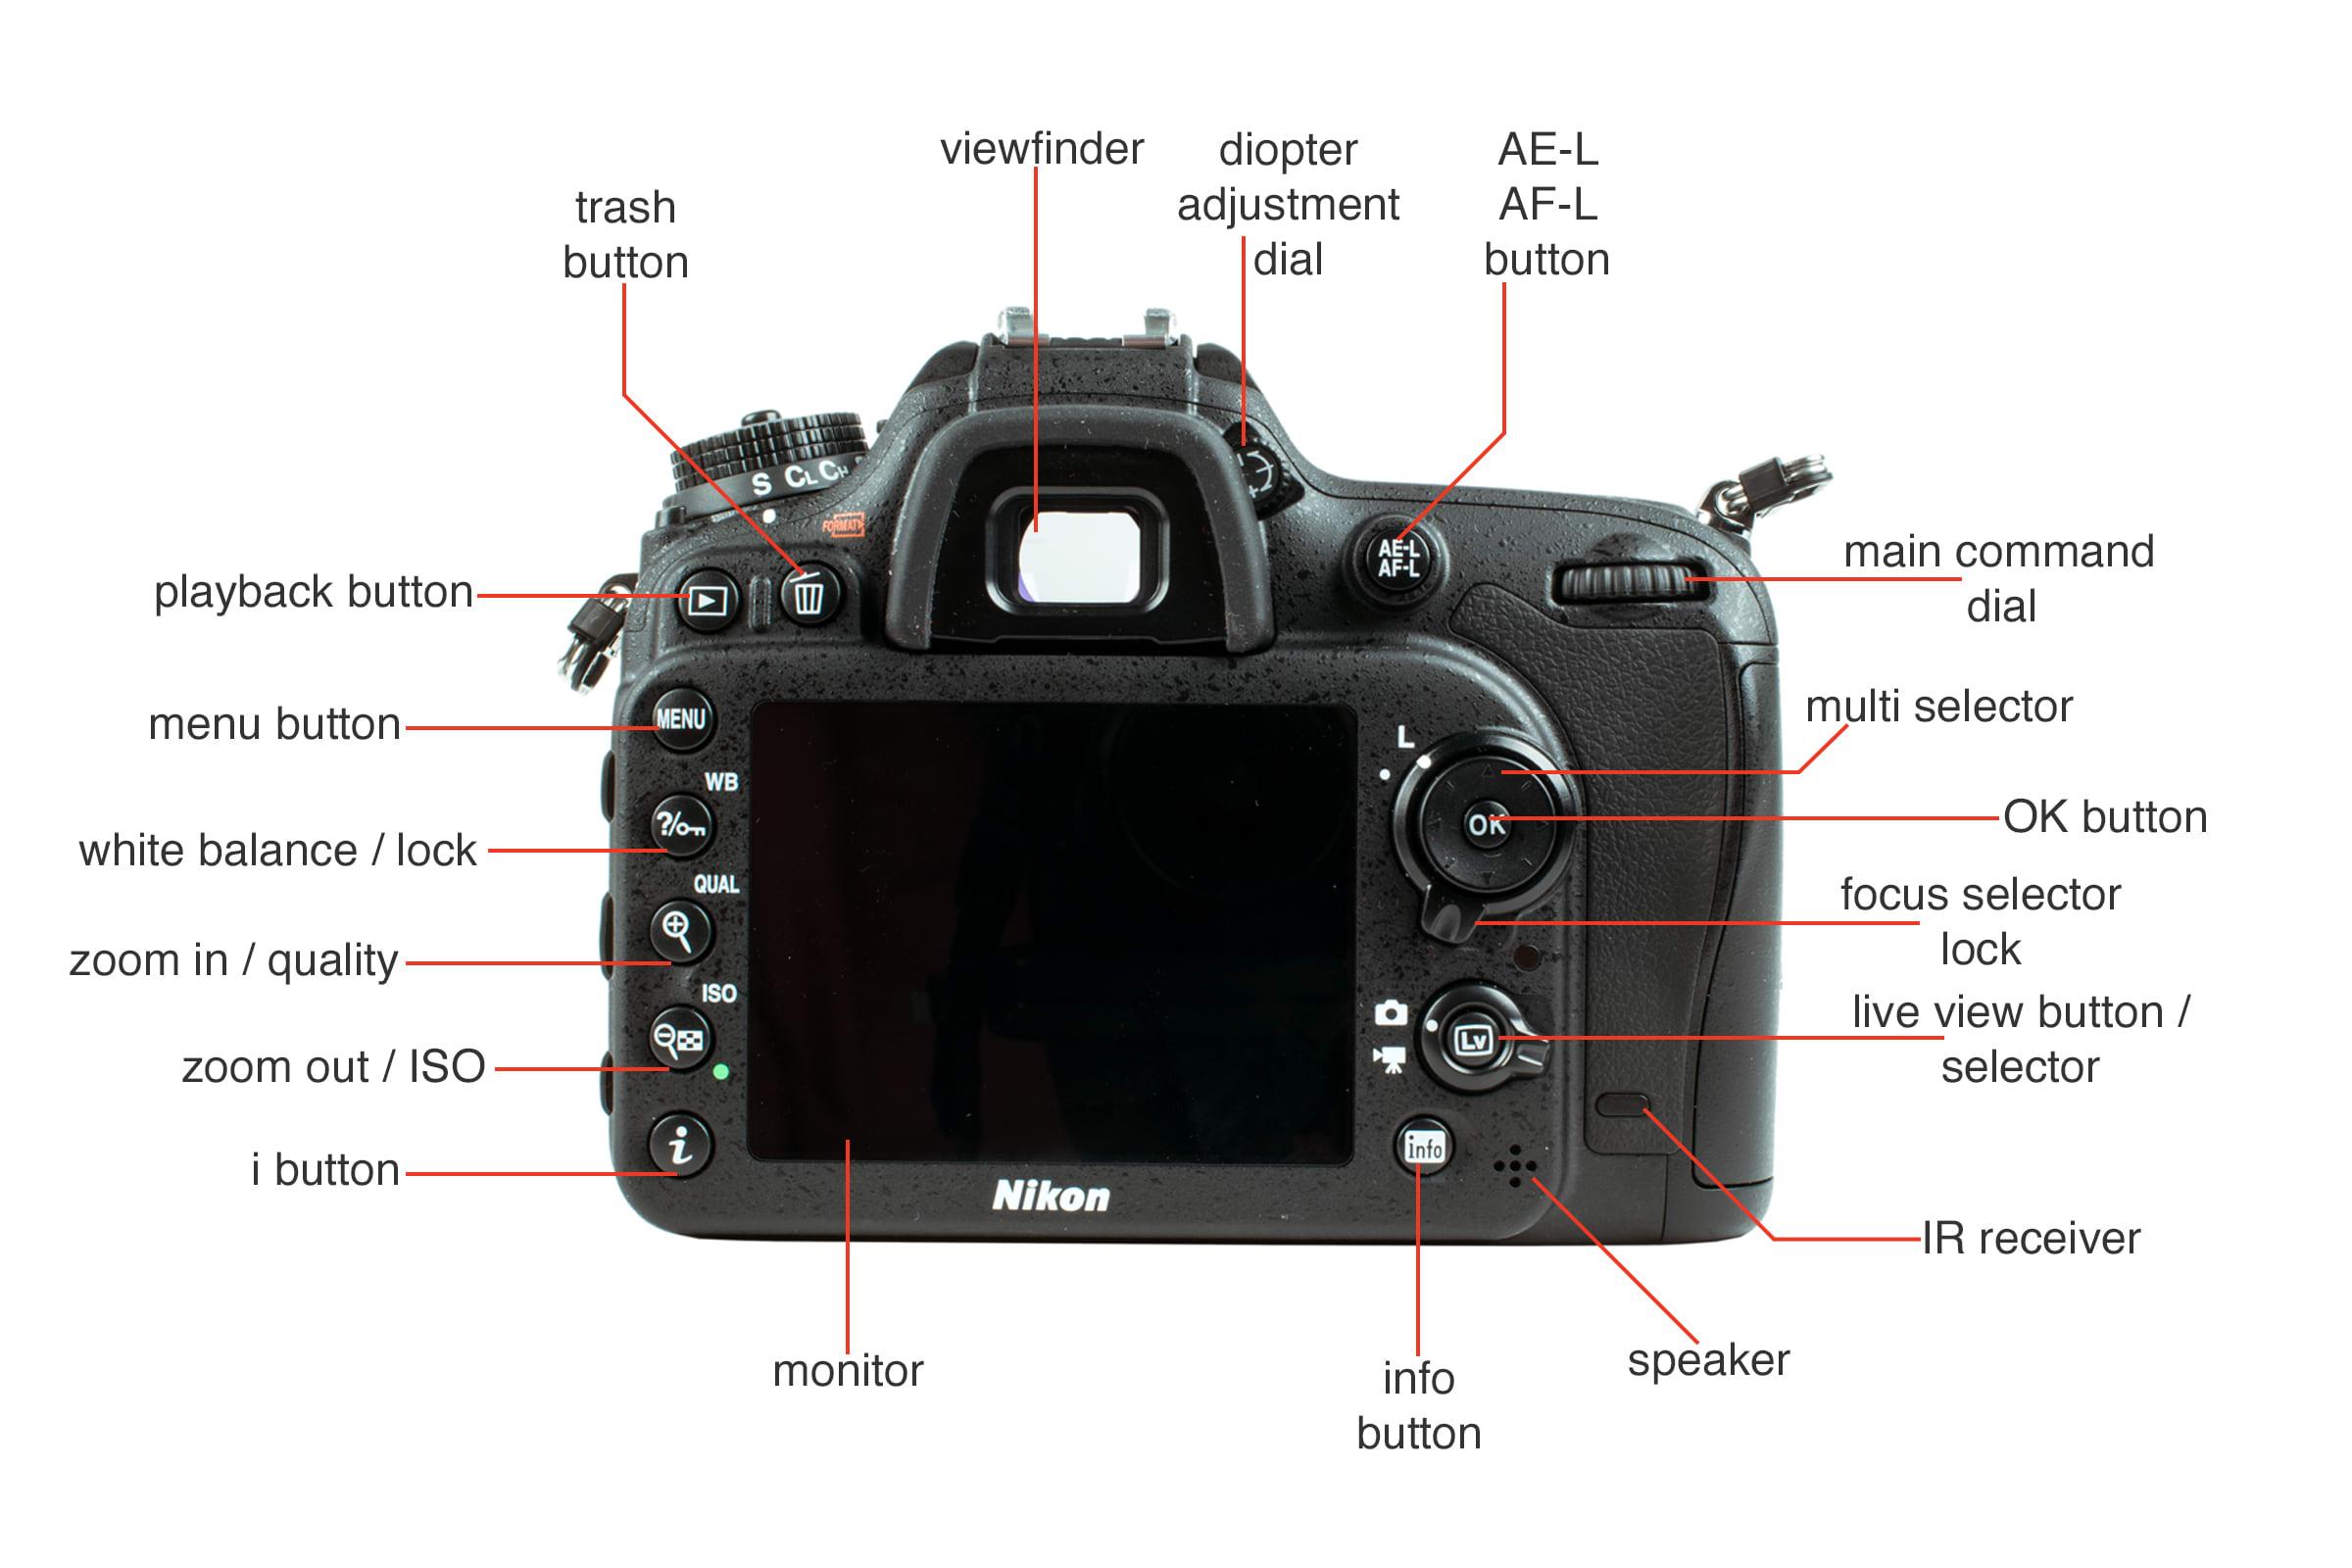 Rear view of the Nikon D7200.